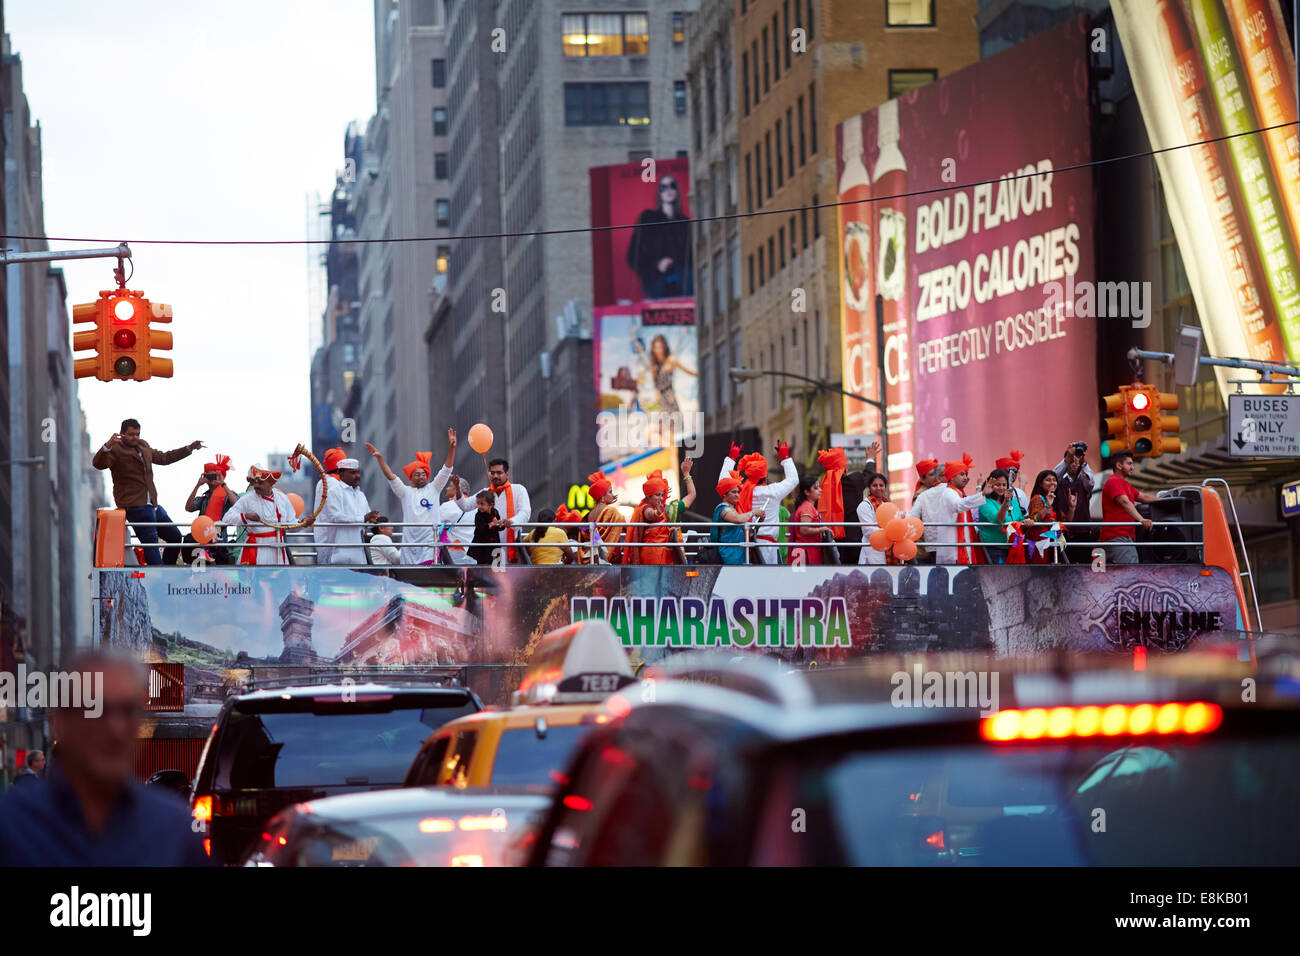 New York city NYC Times Square Maharashtra bus promoting India - Stock Image